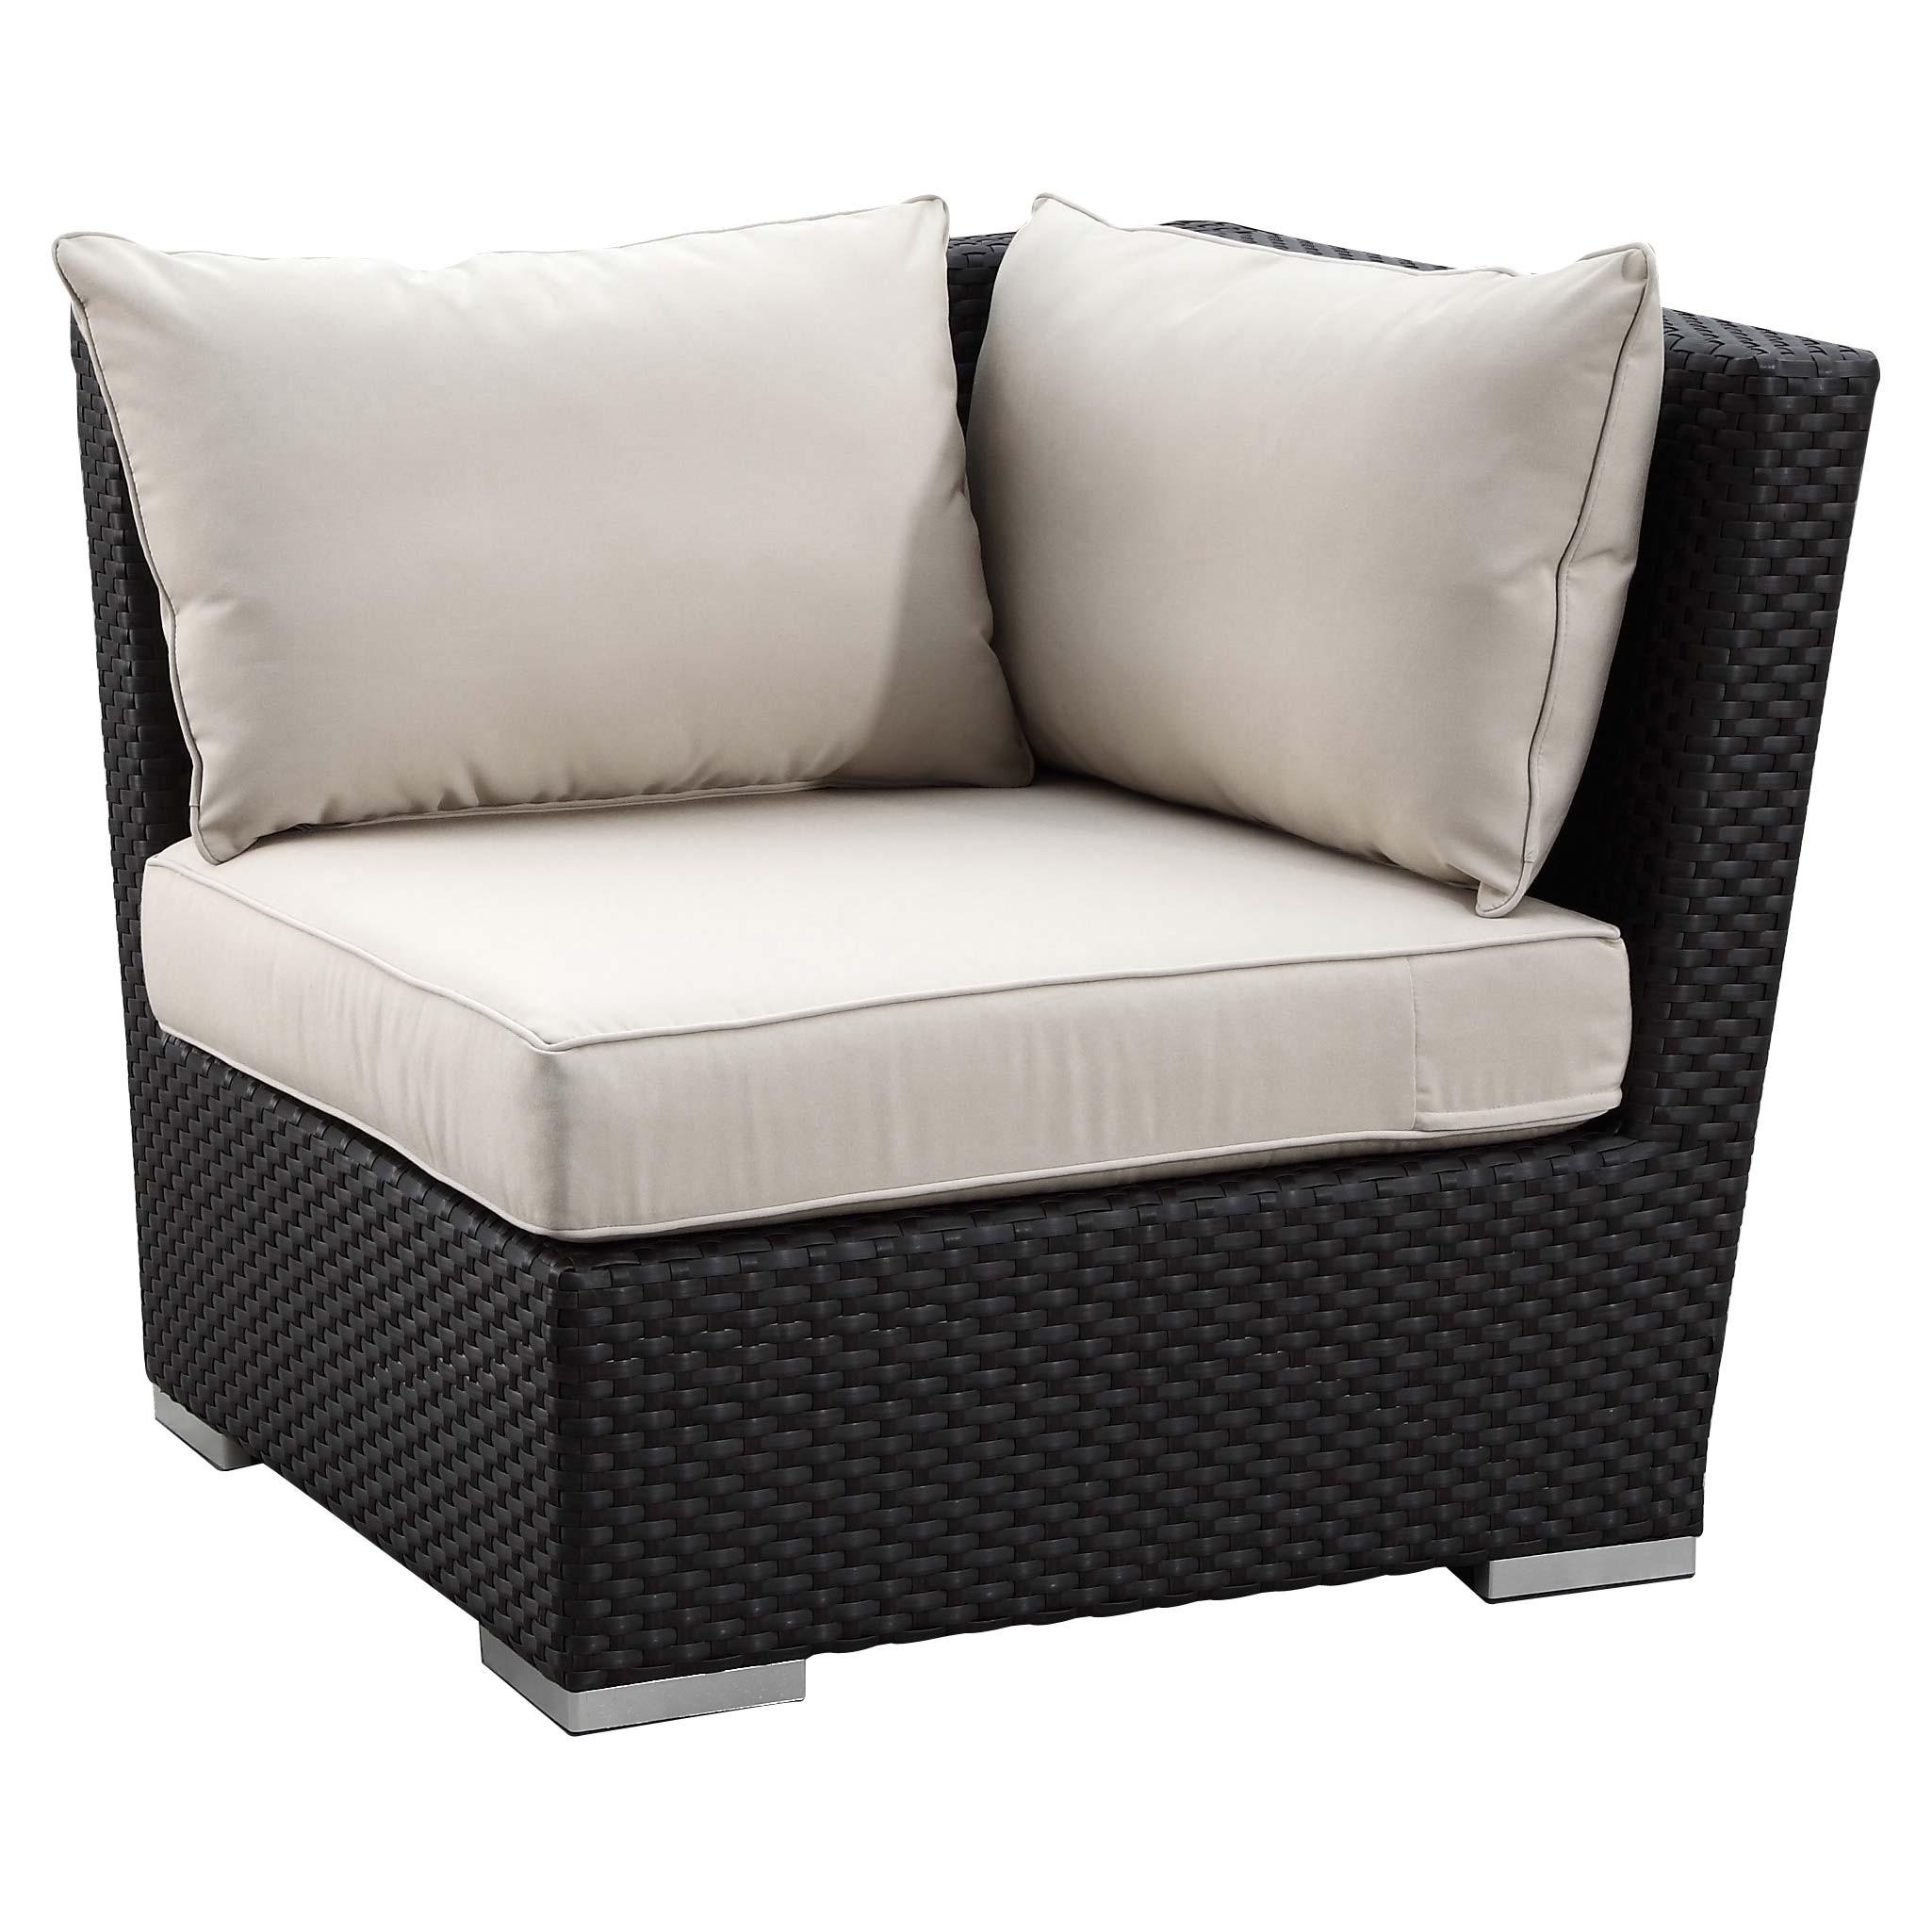 sectional sofa corner wedge modular fabric chair andmv73 wendycorsistaubcommunity